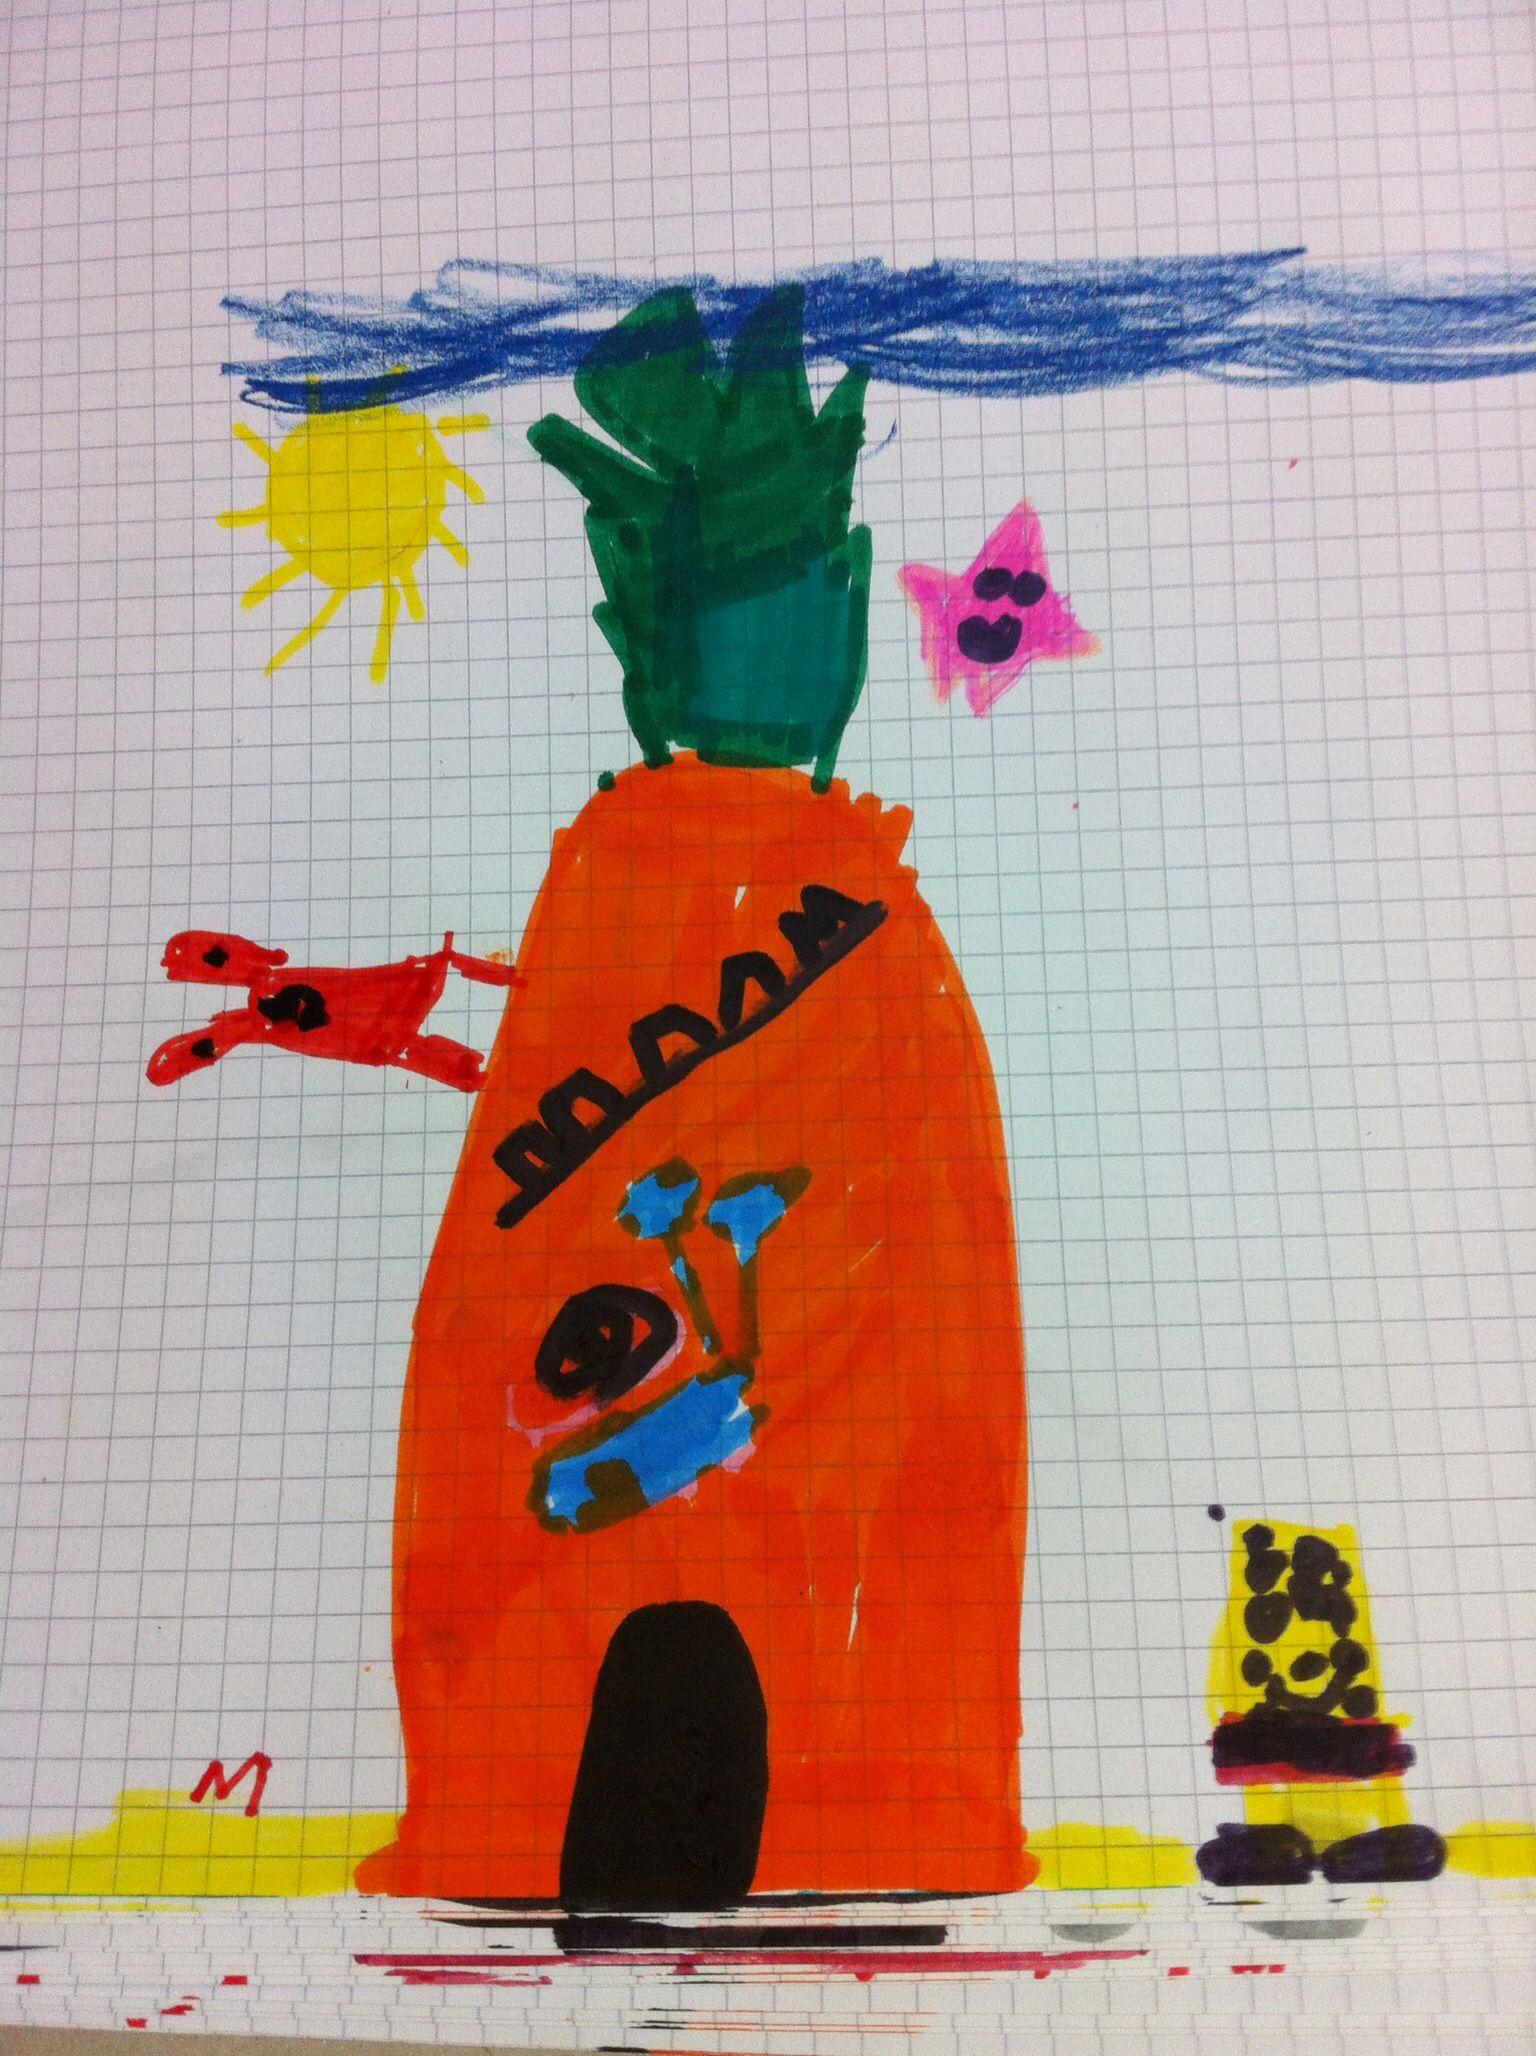 Spongebob by Tom